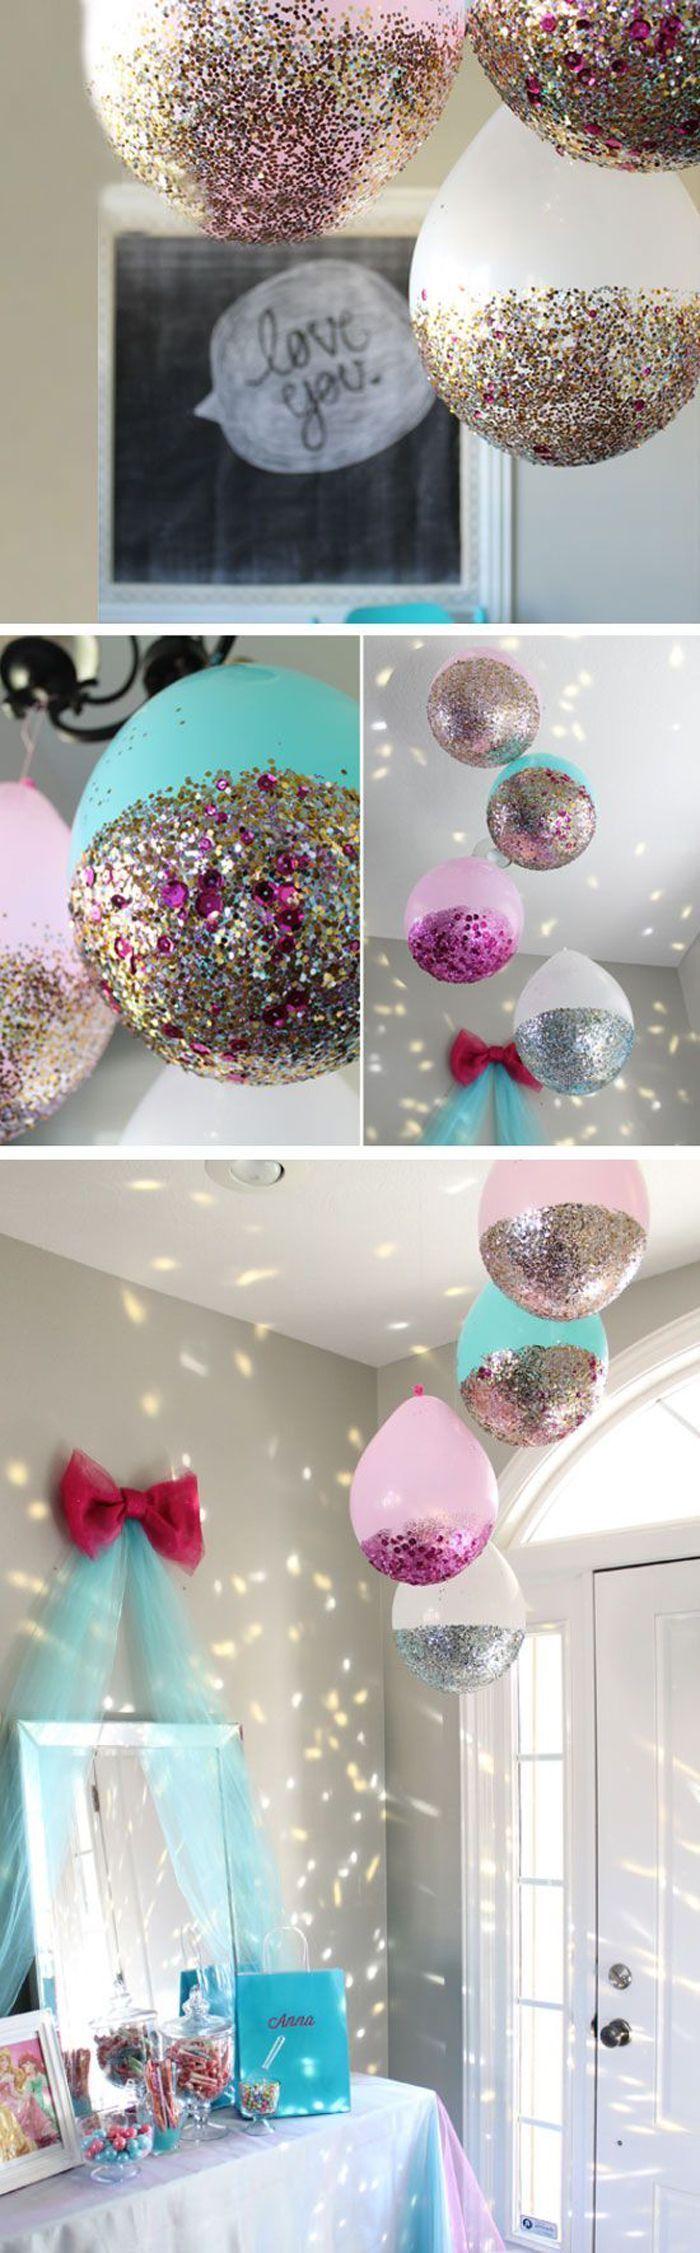 New Years Eve Party Decorations Glitter Unicorns Glitt